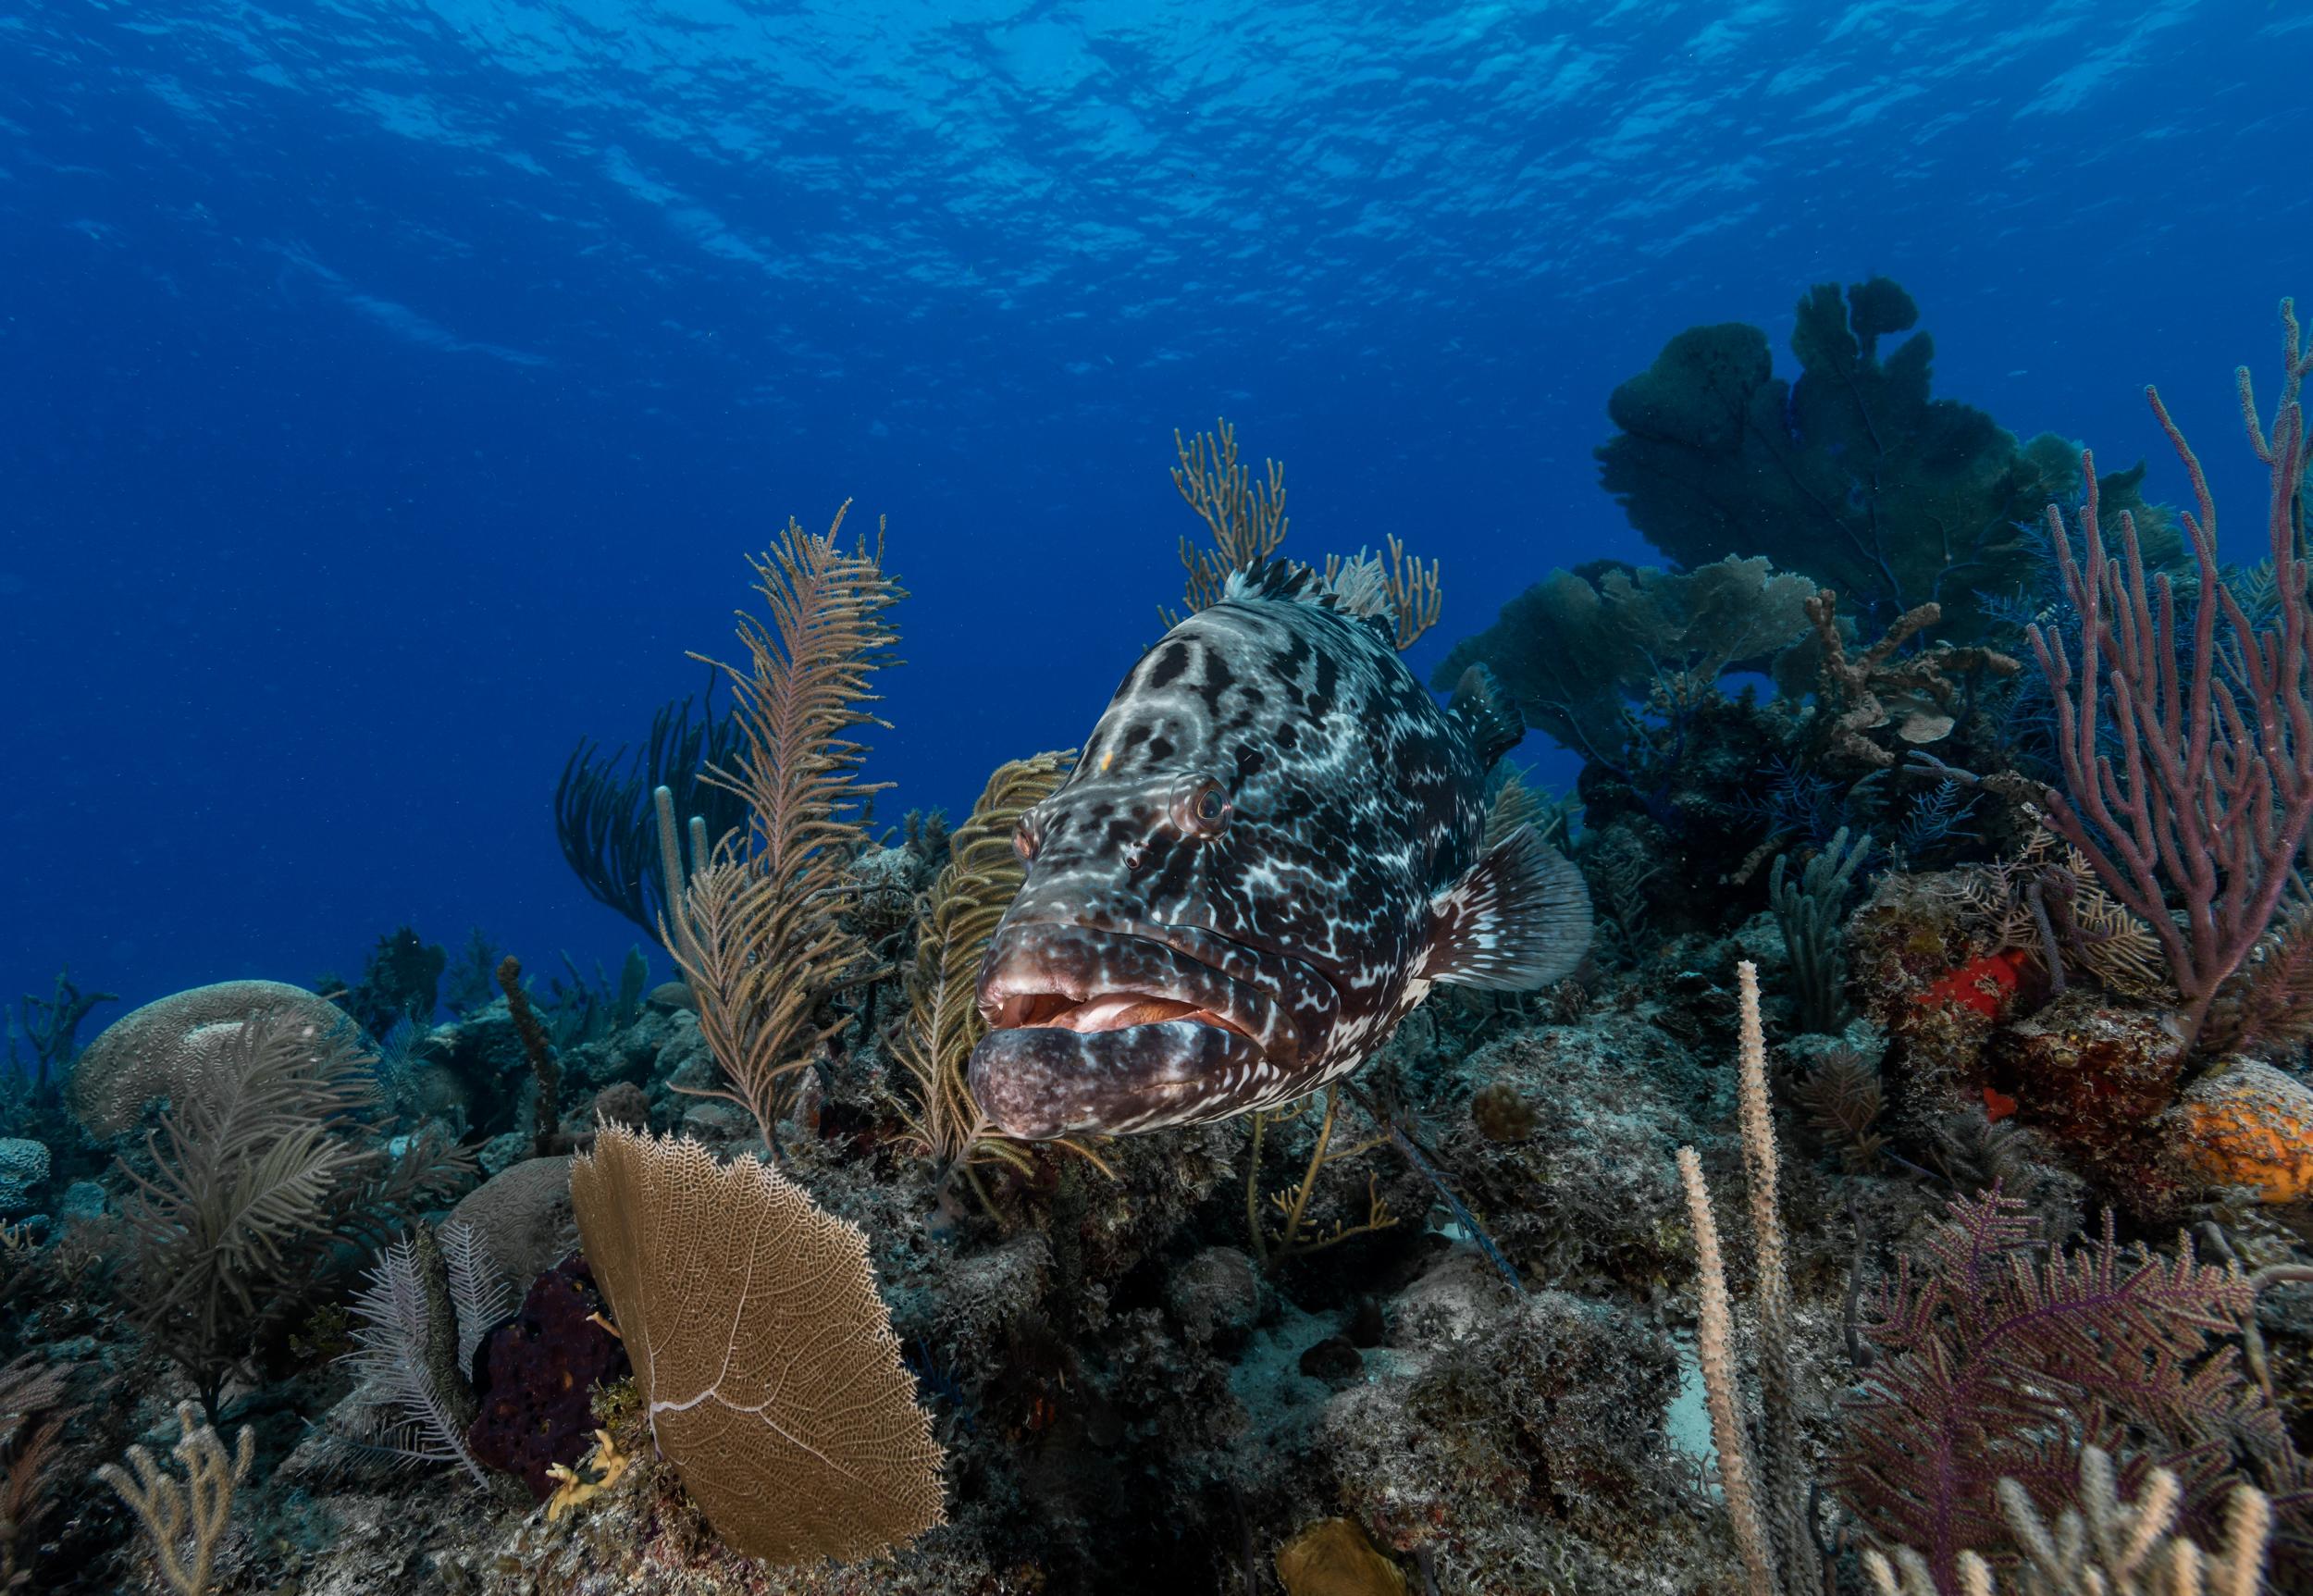 grouper, Jardines De La Reina CRedit: Phillip hamilton / CORAL REEF IMAGE BANK